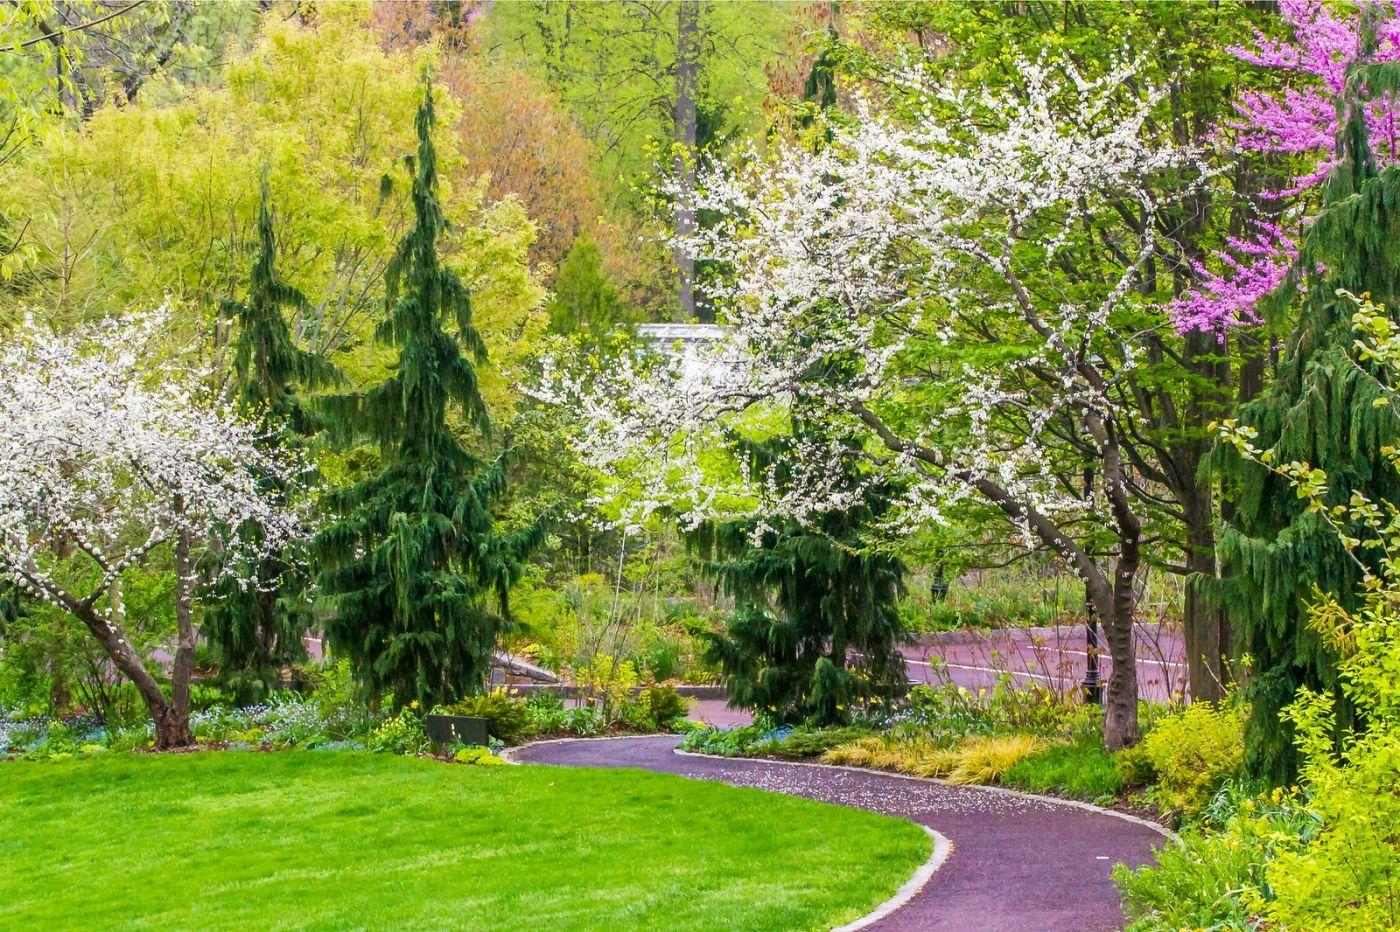 Chanticleer花园,融入自然_图1-28